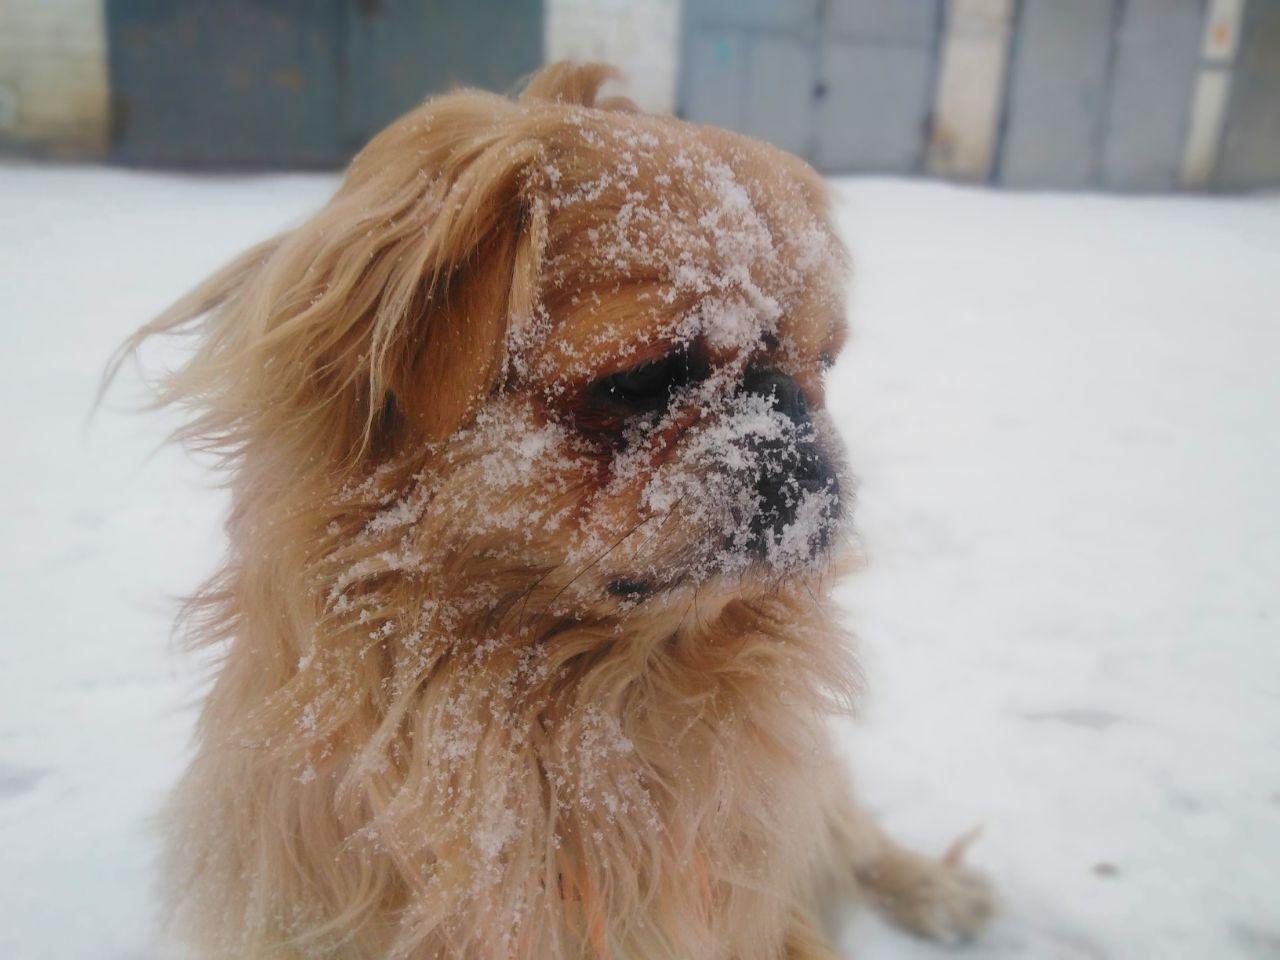 Лёгкий январский снежок в Чите. Фото Эдуарда Петрищева. Чита, улица Балябина. 24 января 2021 год.